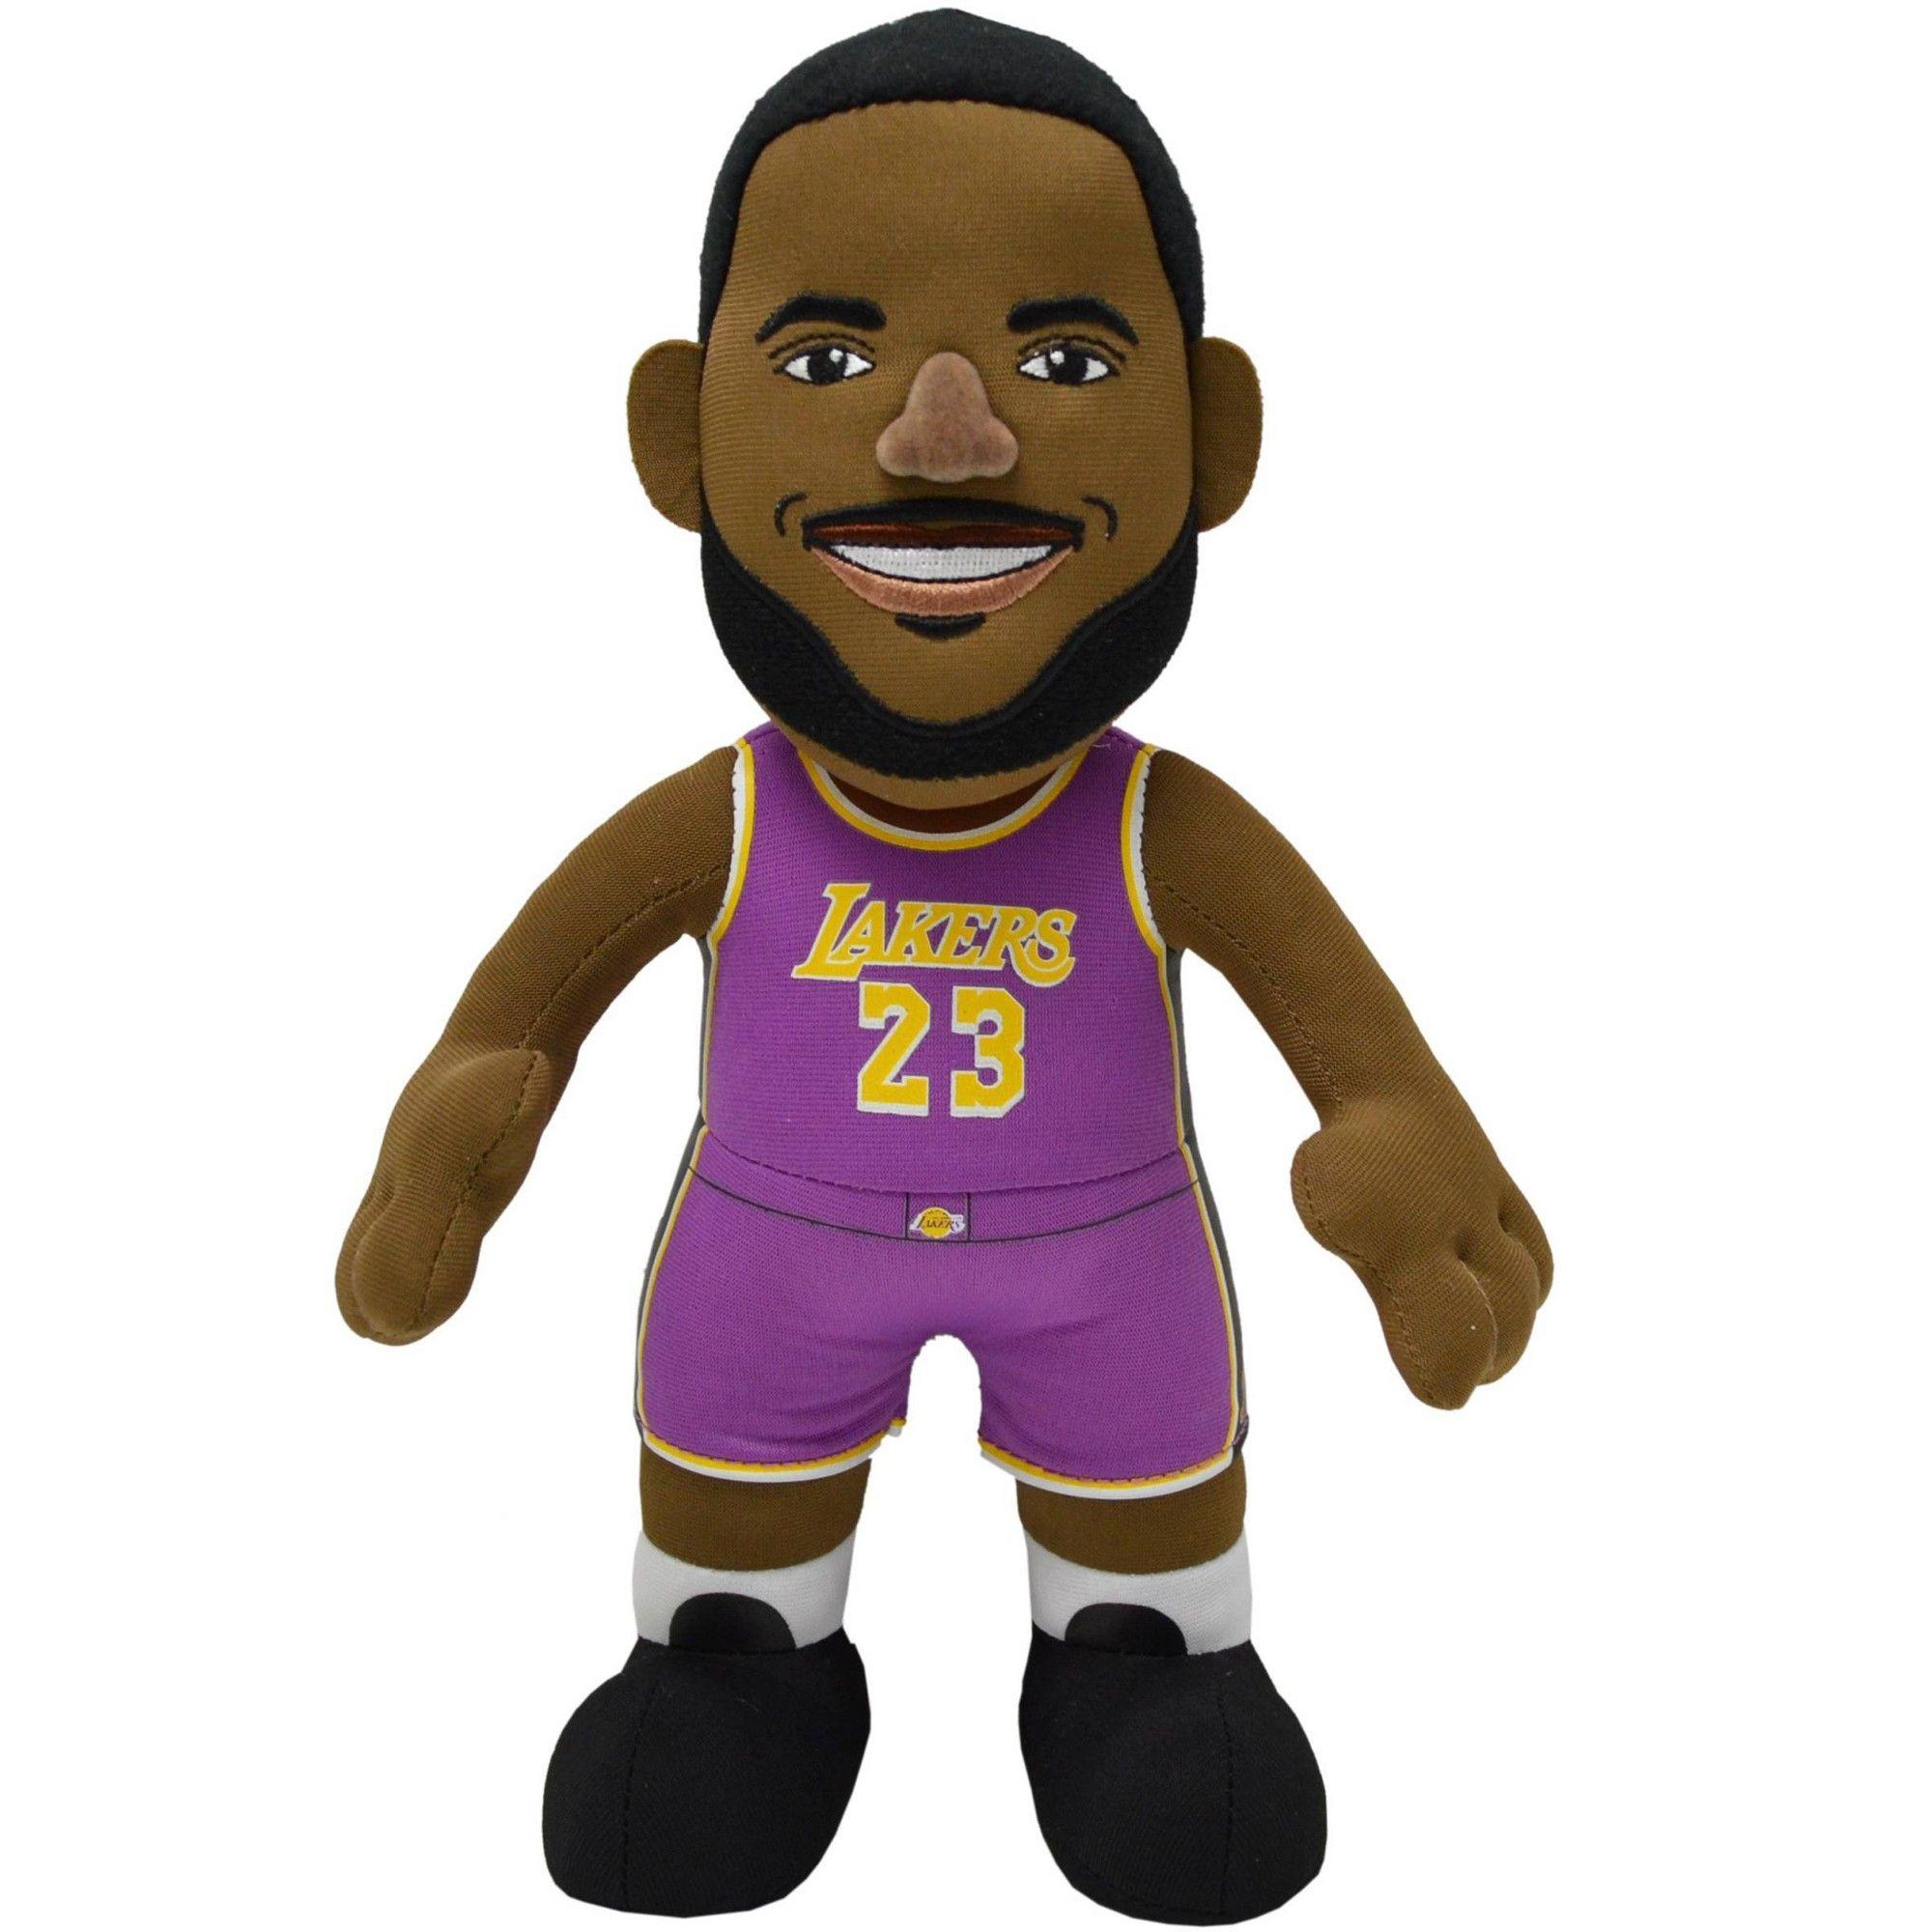 Nba Los Angeles Lakers Bleacher Creatures Purple Lebron James Plush Figure 10 In 2020 Los Angeles Lakers Lebron James Nba Los Angeles